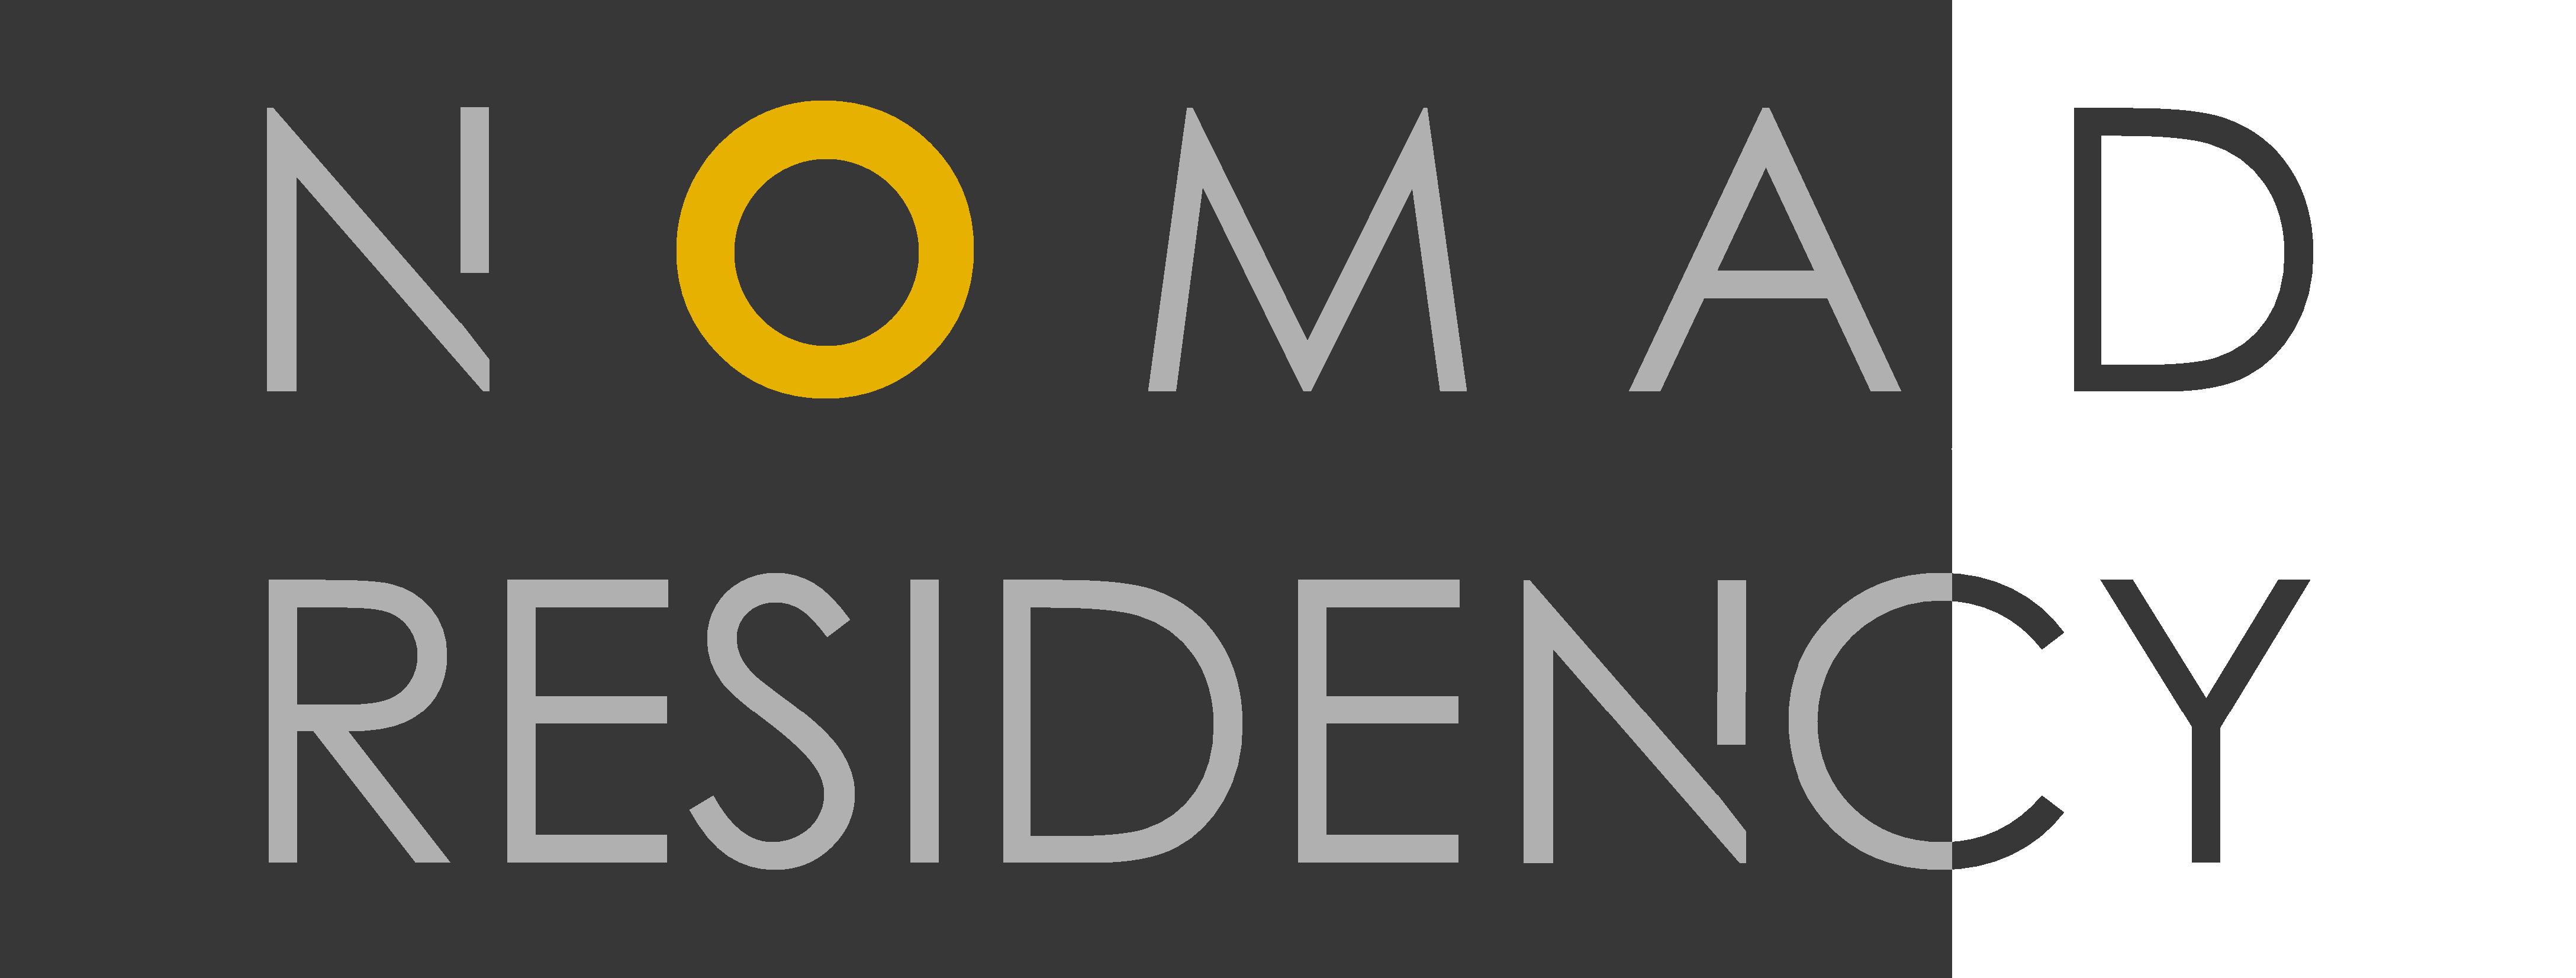 Nomad Residency